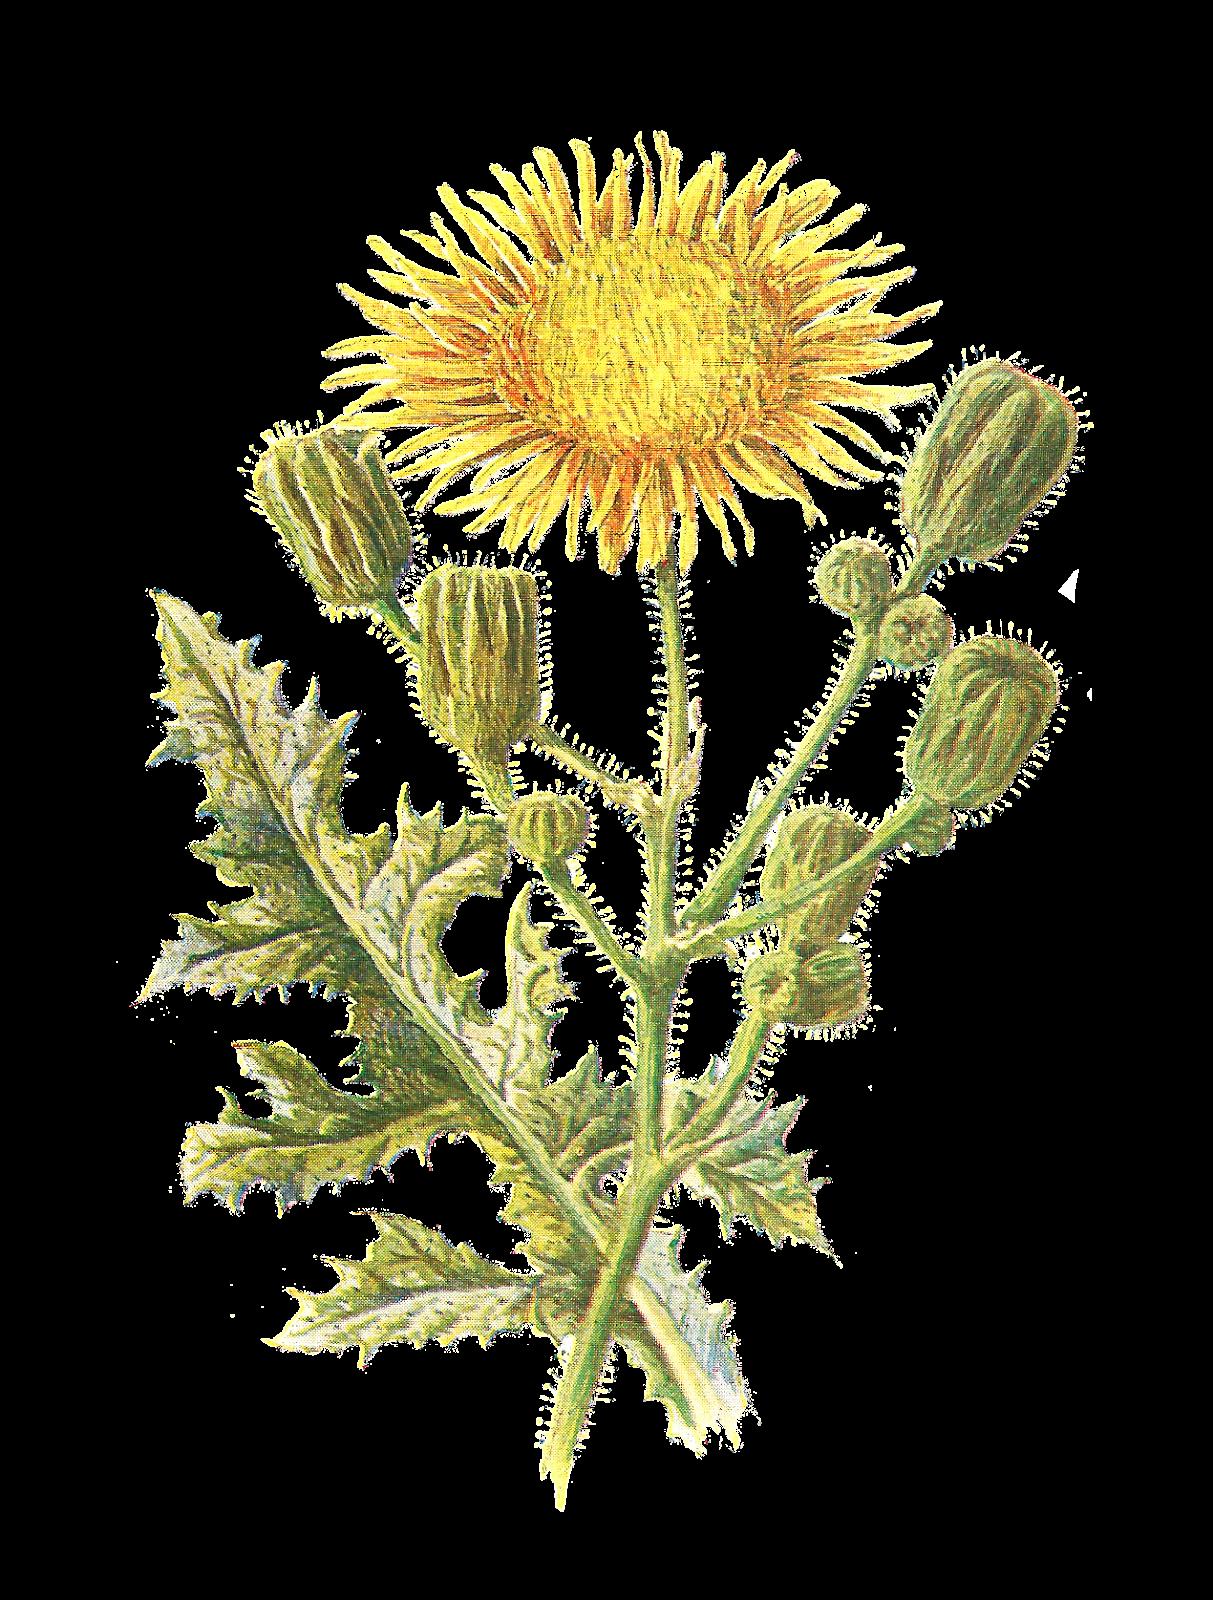 Antique Images: Vintage Scrapbooking Wildflower Download Printable.